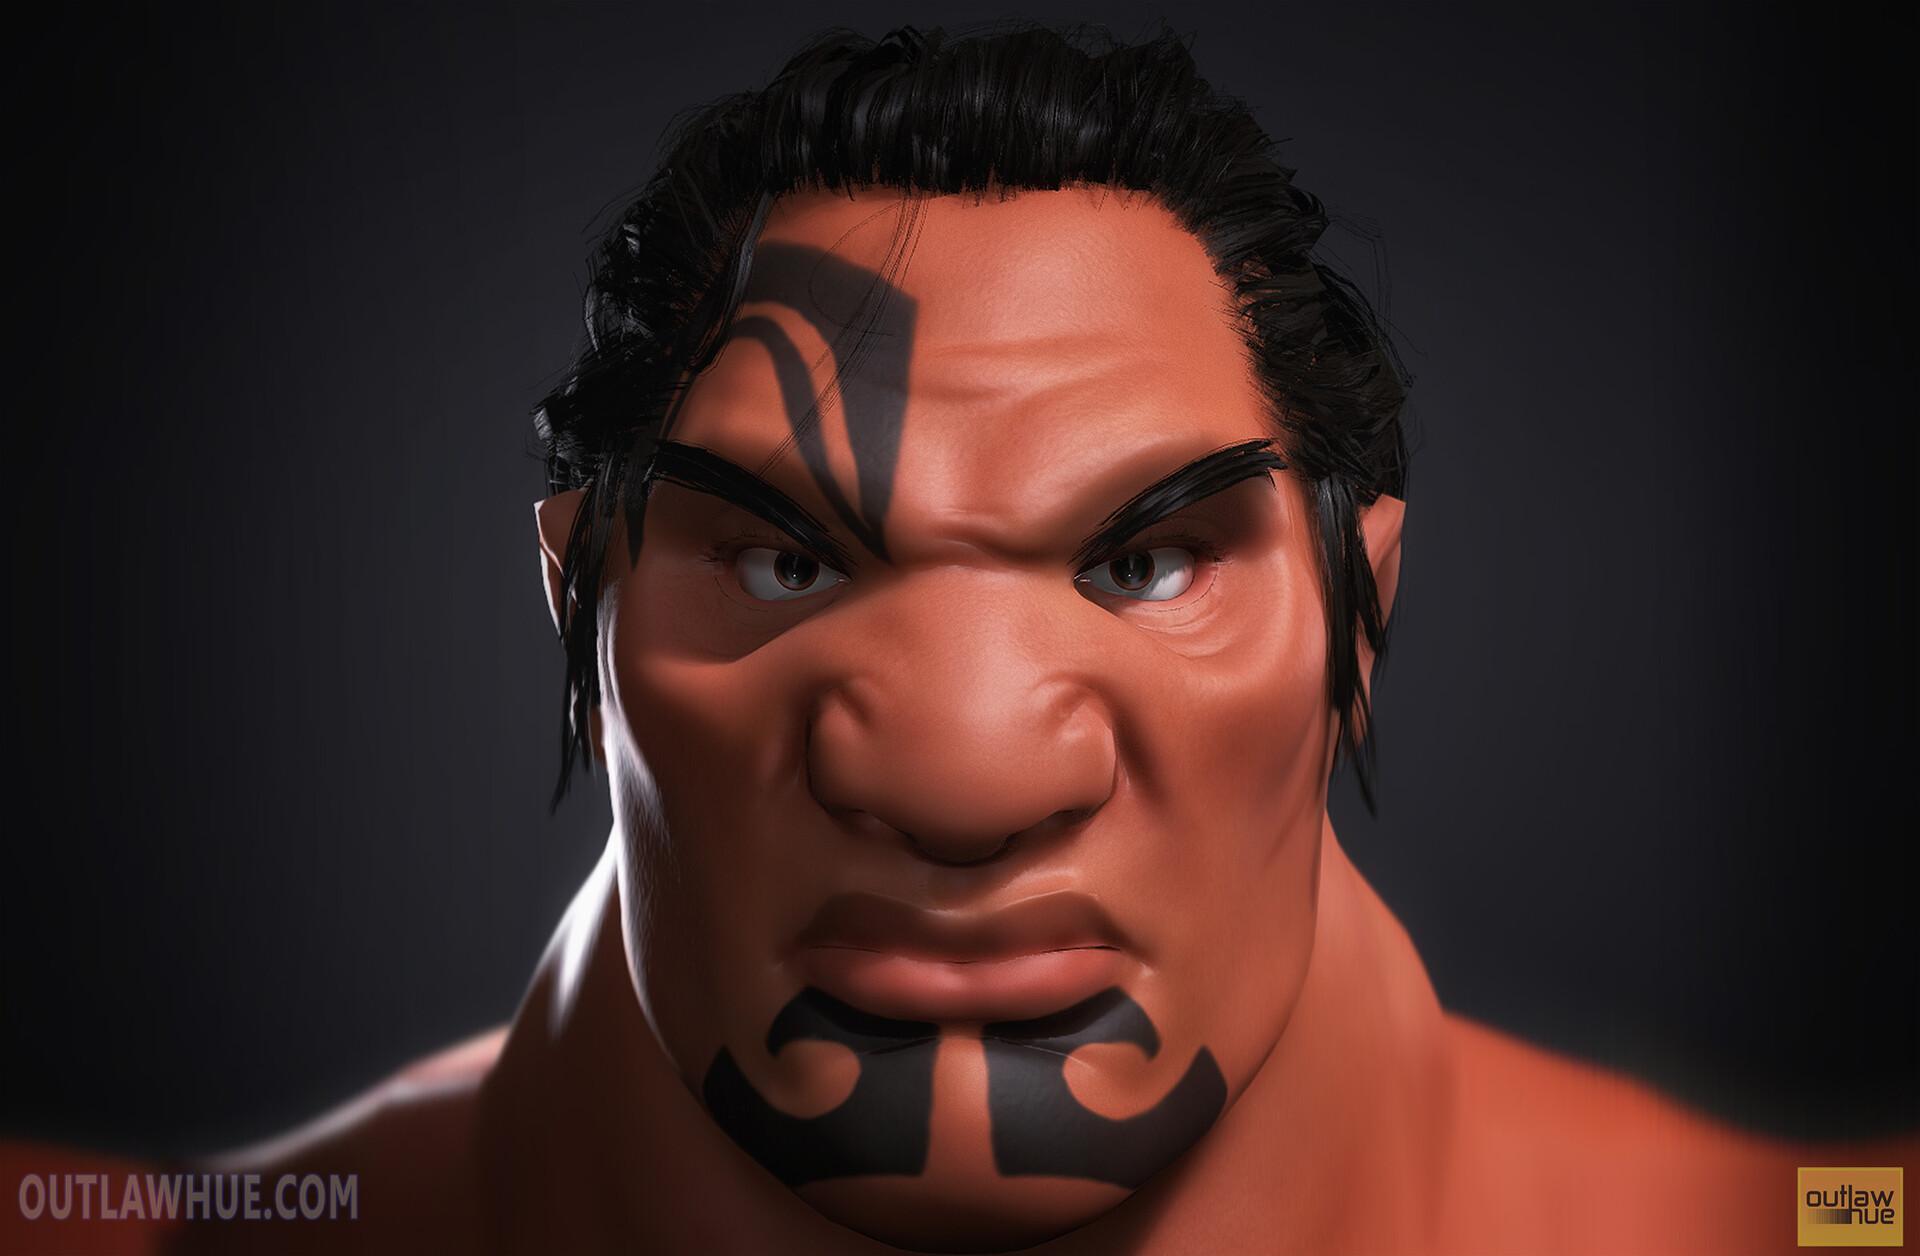 Headshot rendered in Marmoset Toolbag